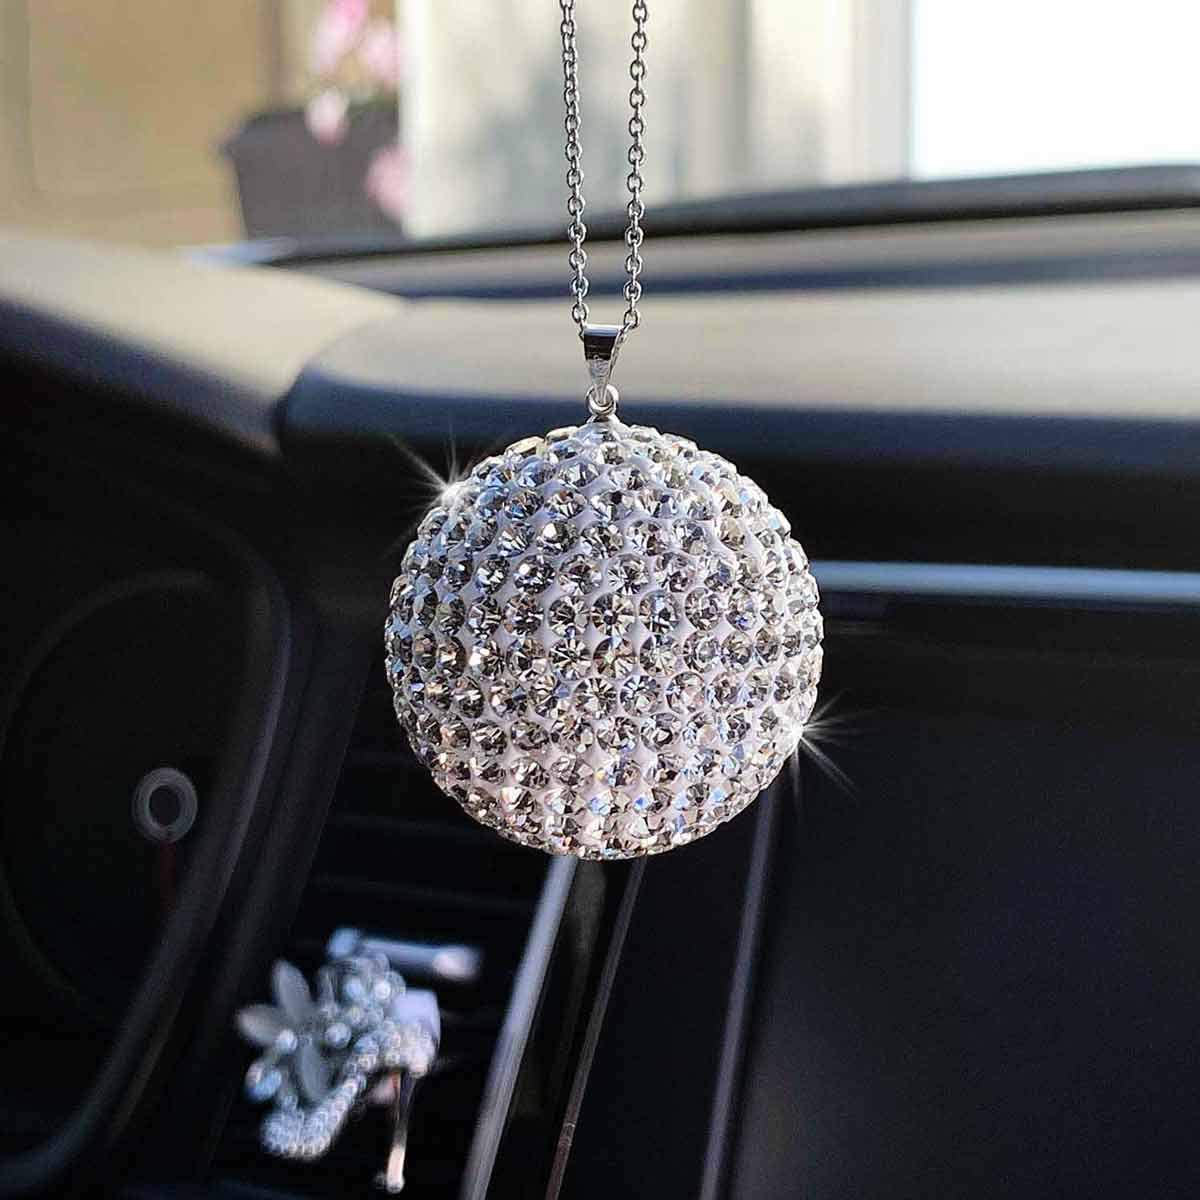 Floating Crystal Car Mirror Charms Car Charm /& Home Decor Ornament Sun Catcher Hanging Ornament w//Chain Bling Car Decor Clear Diamond Cube Rear View Mirror Charms Clear Bling Car Accessories